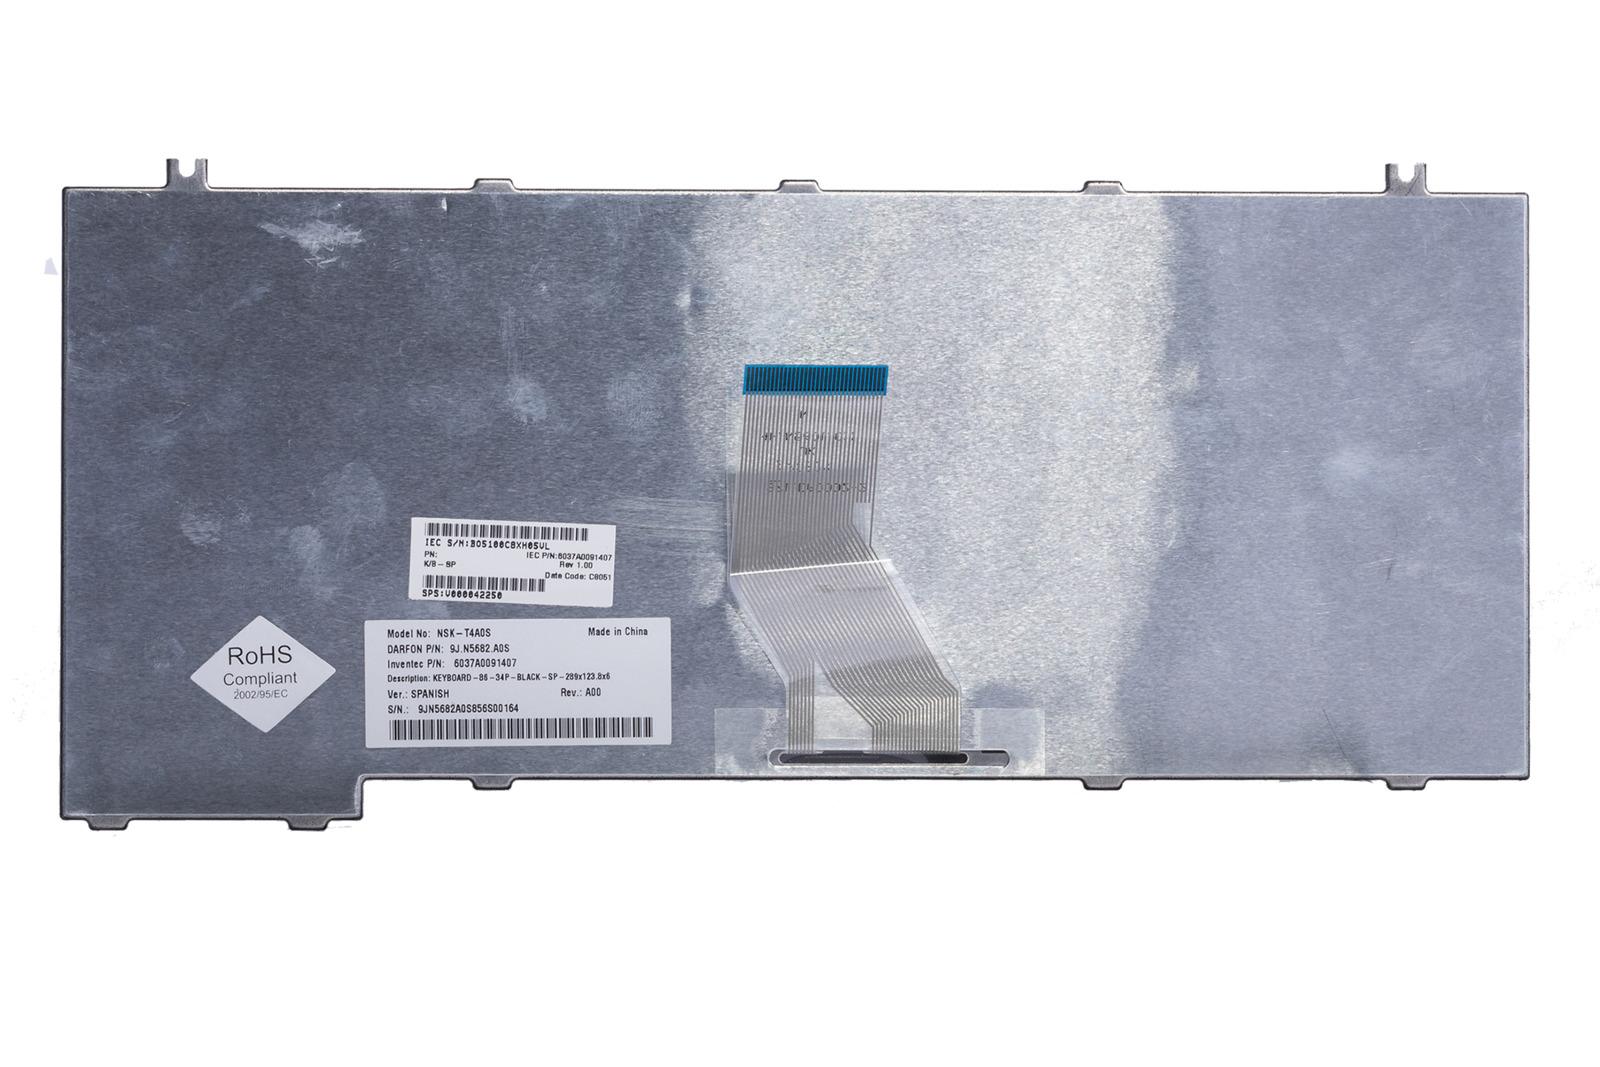 Klawiatura Toshiba 9J.N5682.A0S (Hiszpańska)